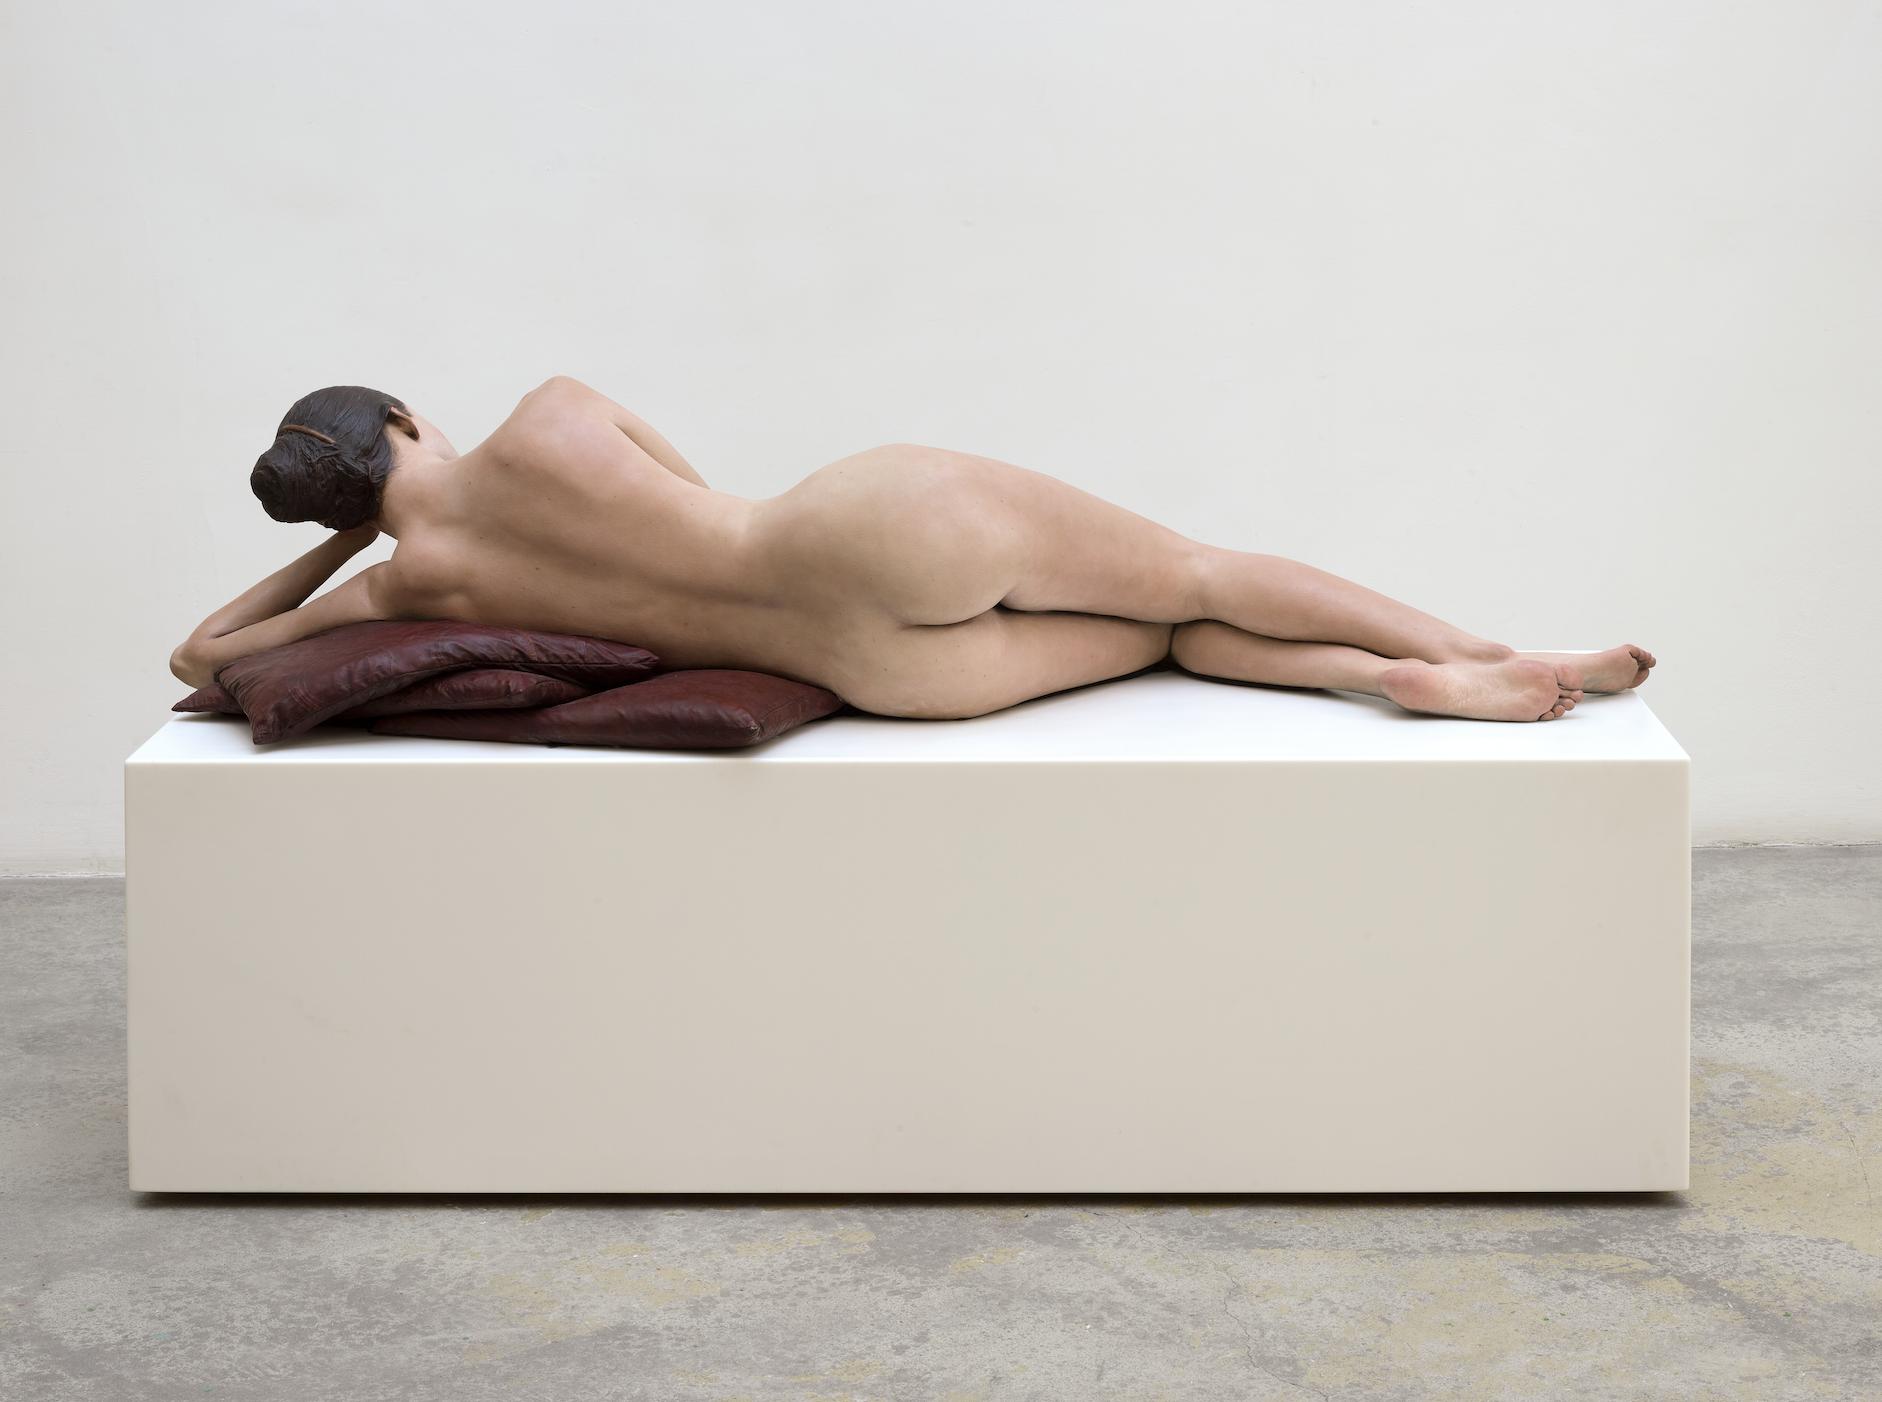 Galerie Georges-Philippe & Nathalie Vallois, John DeAndrea, Jennifer